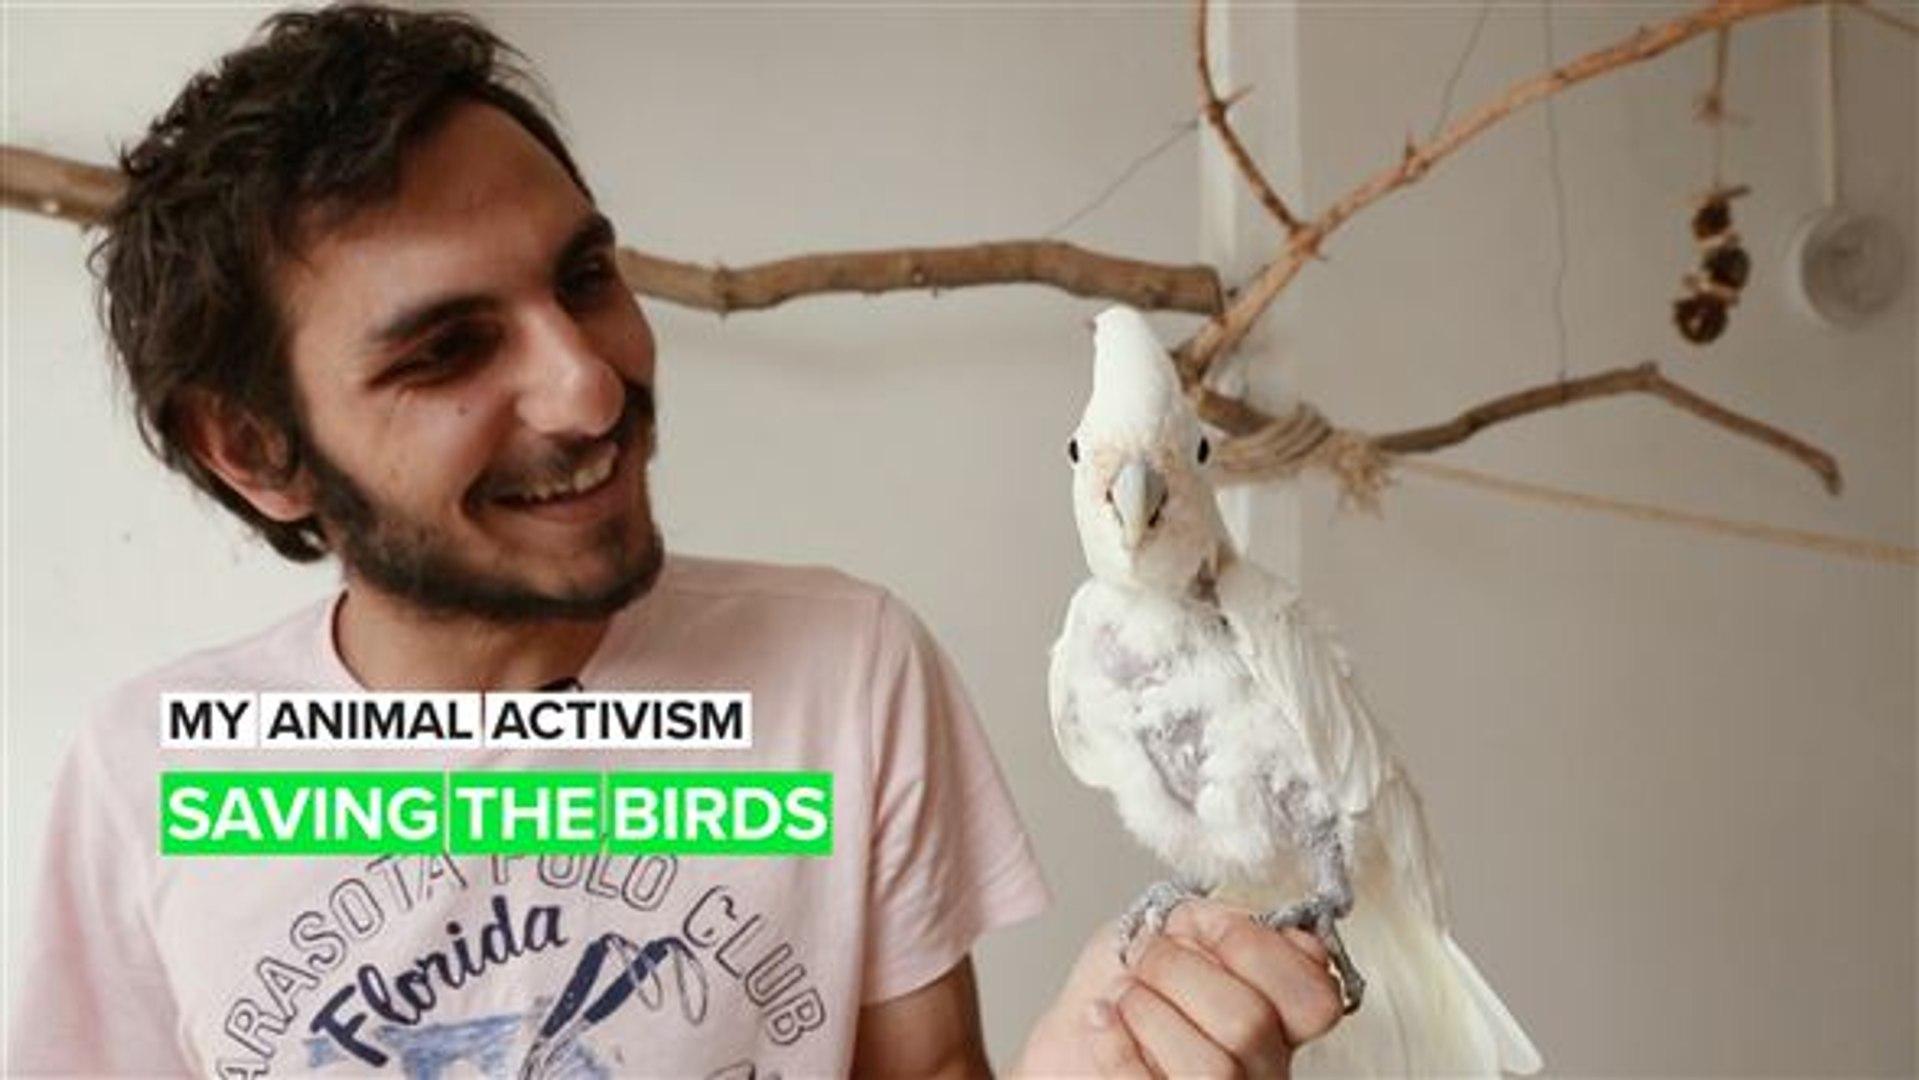 My Animal Activism: The Birdman